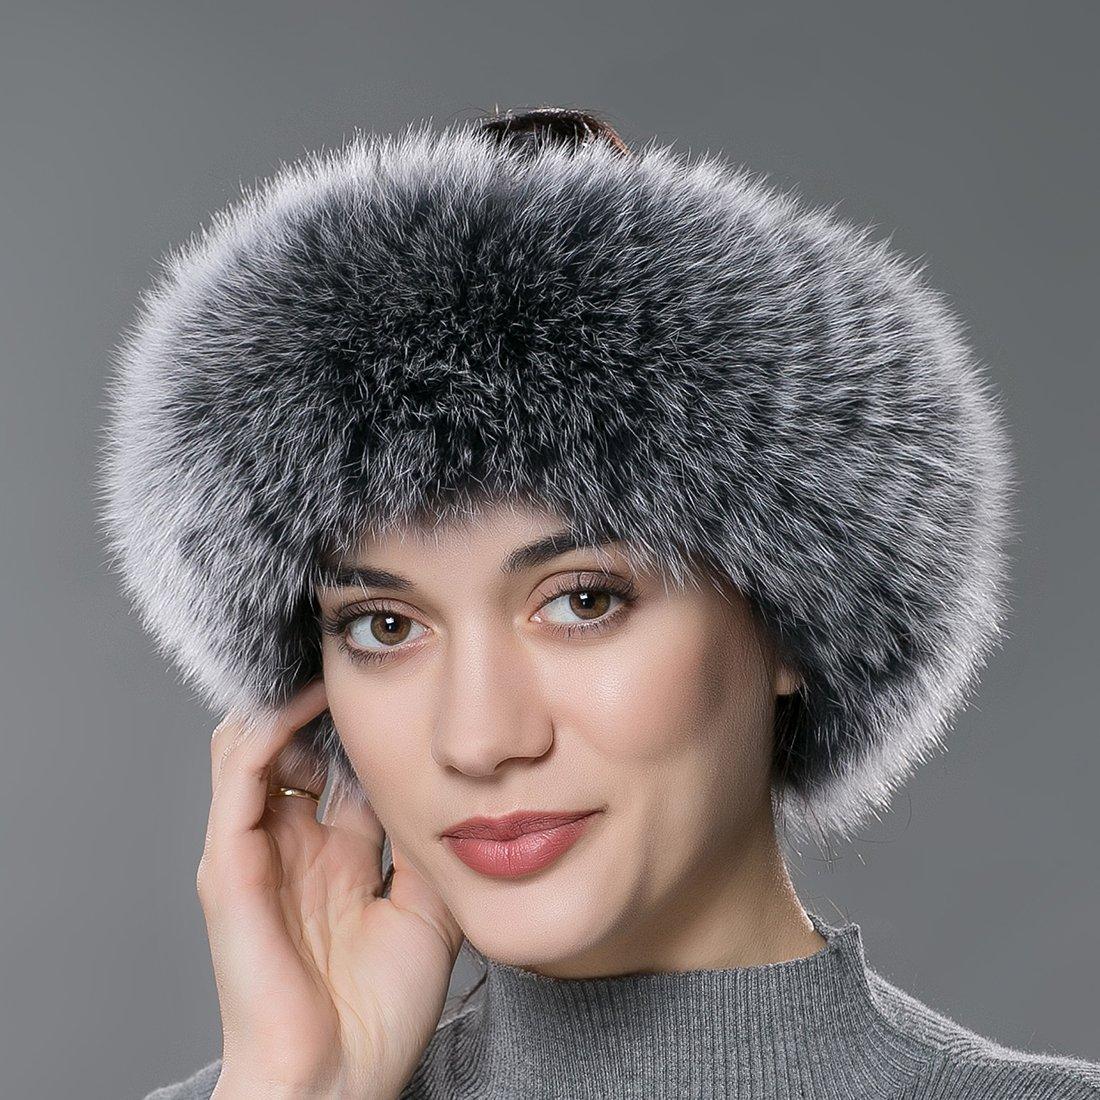 URSFUR Winter Fur Headband Women Warm Real Fox Fur Knitted Headband Earmuffs Gray Frost by URSFUR (Image #2)